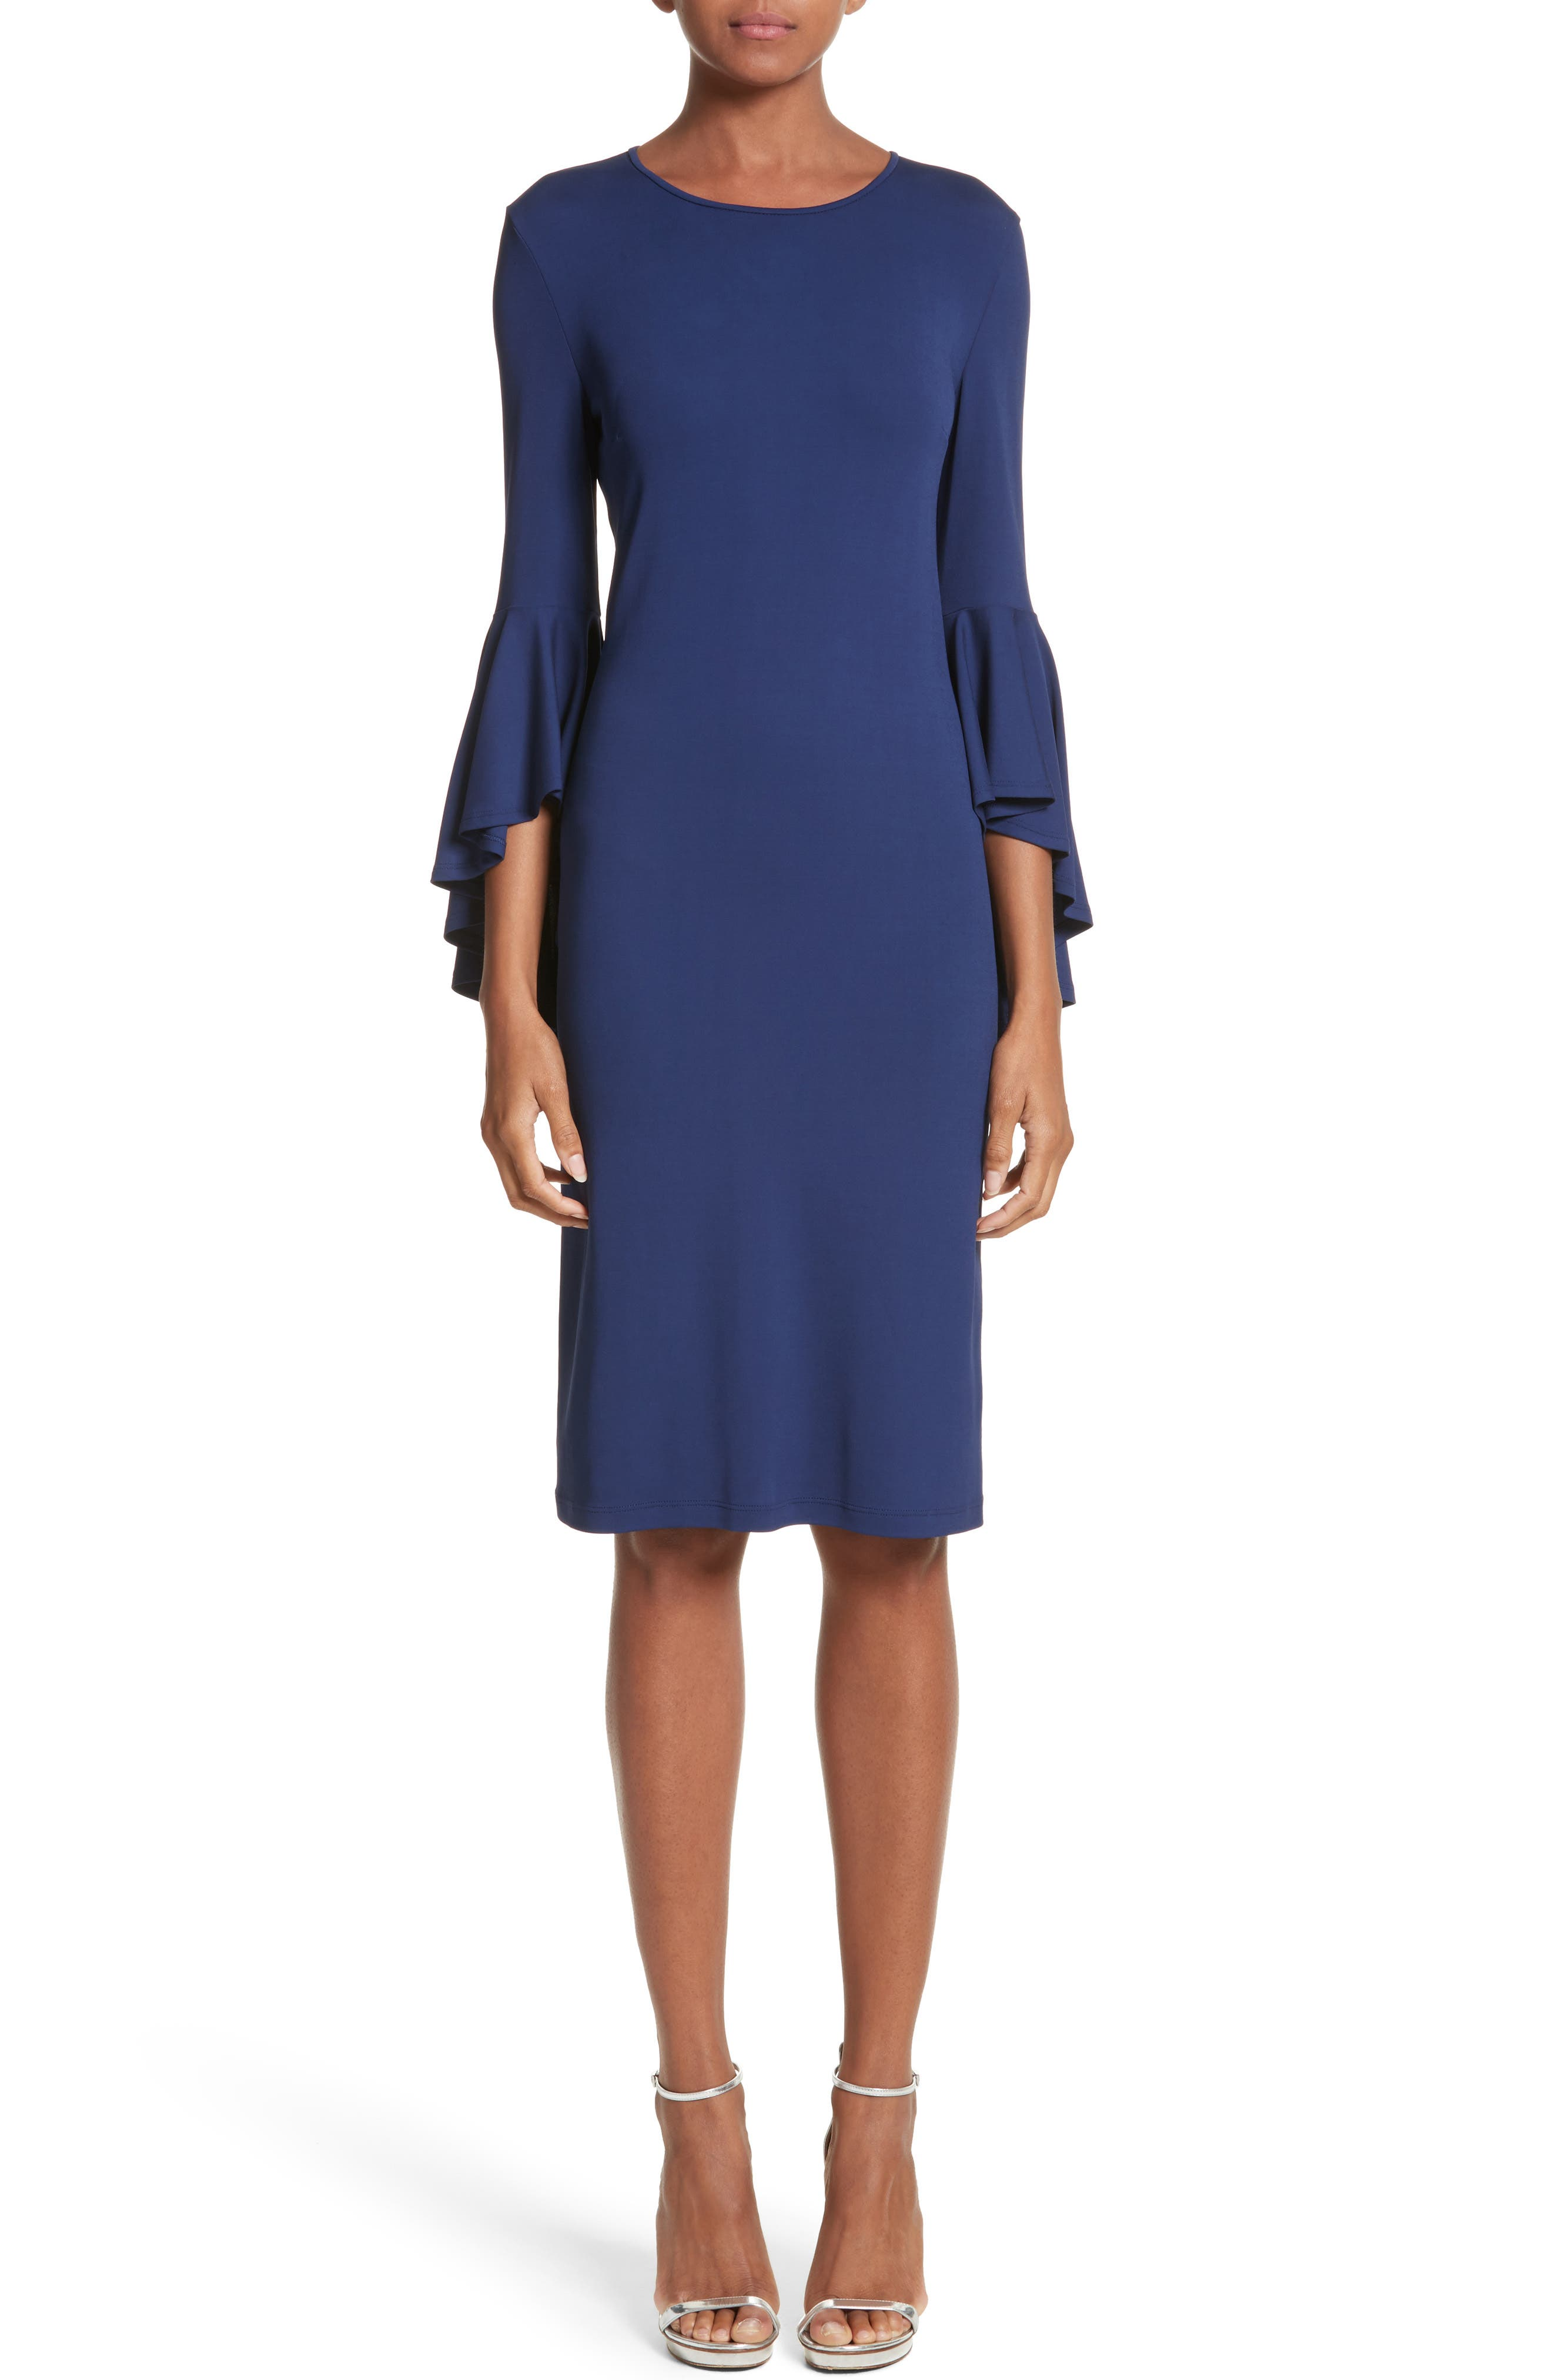 Alternate Image 1 Selected - Michael Kors Cascade Sleeve Sheath Dress